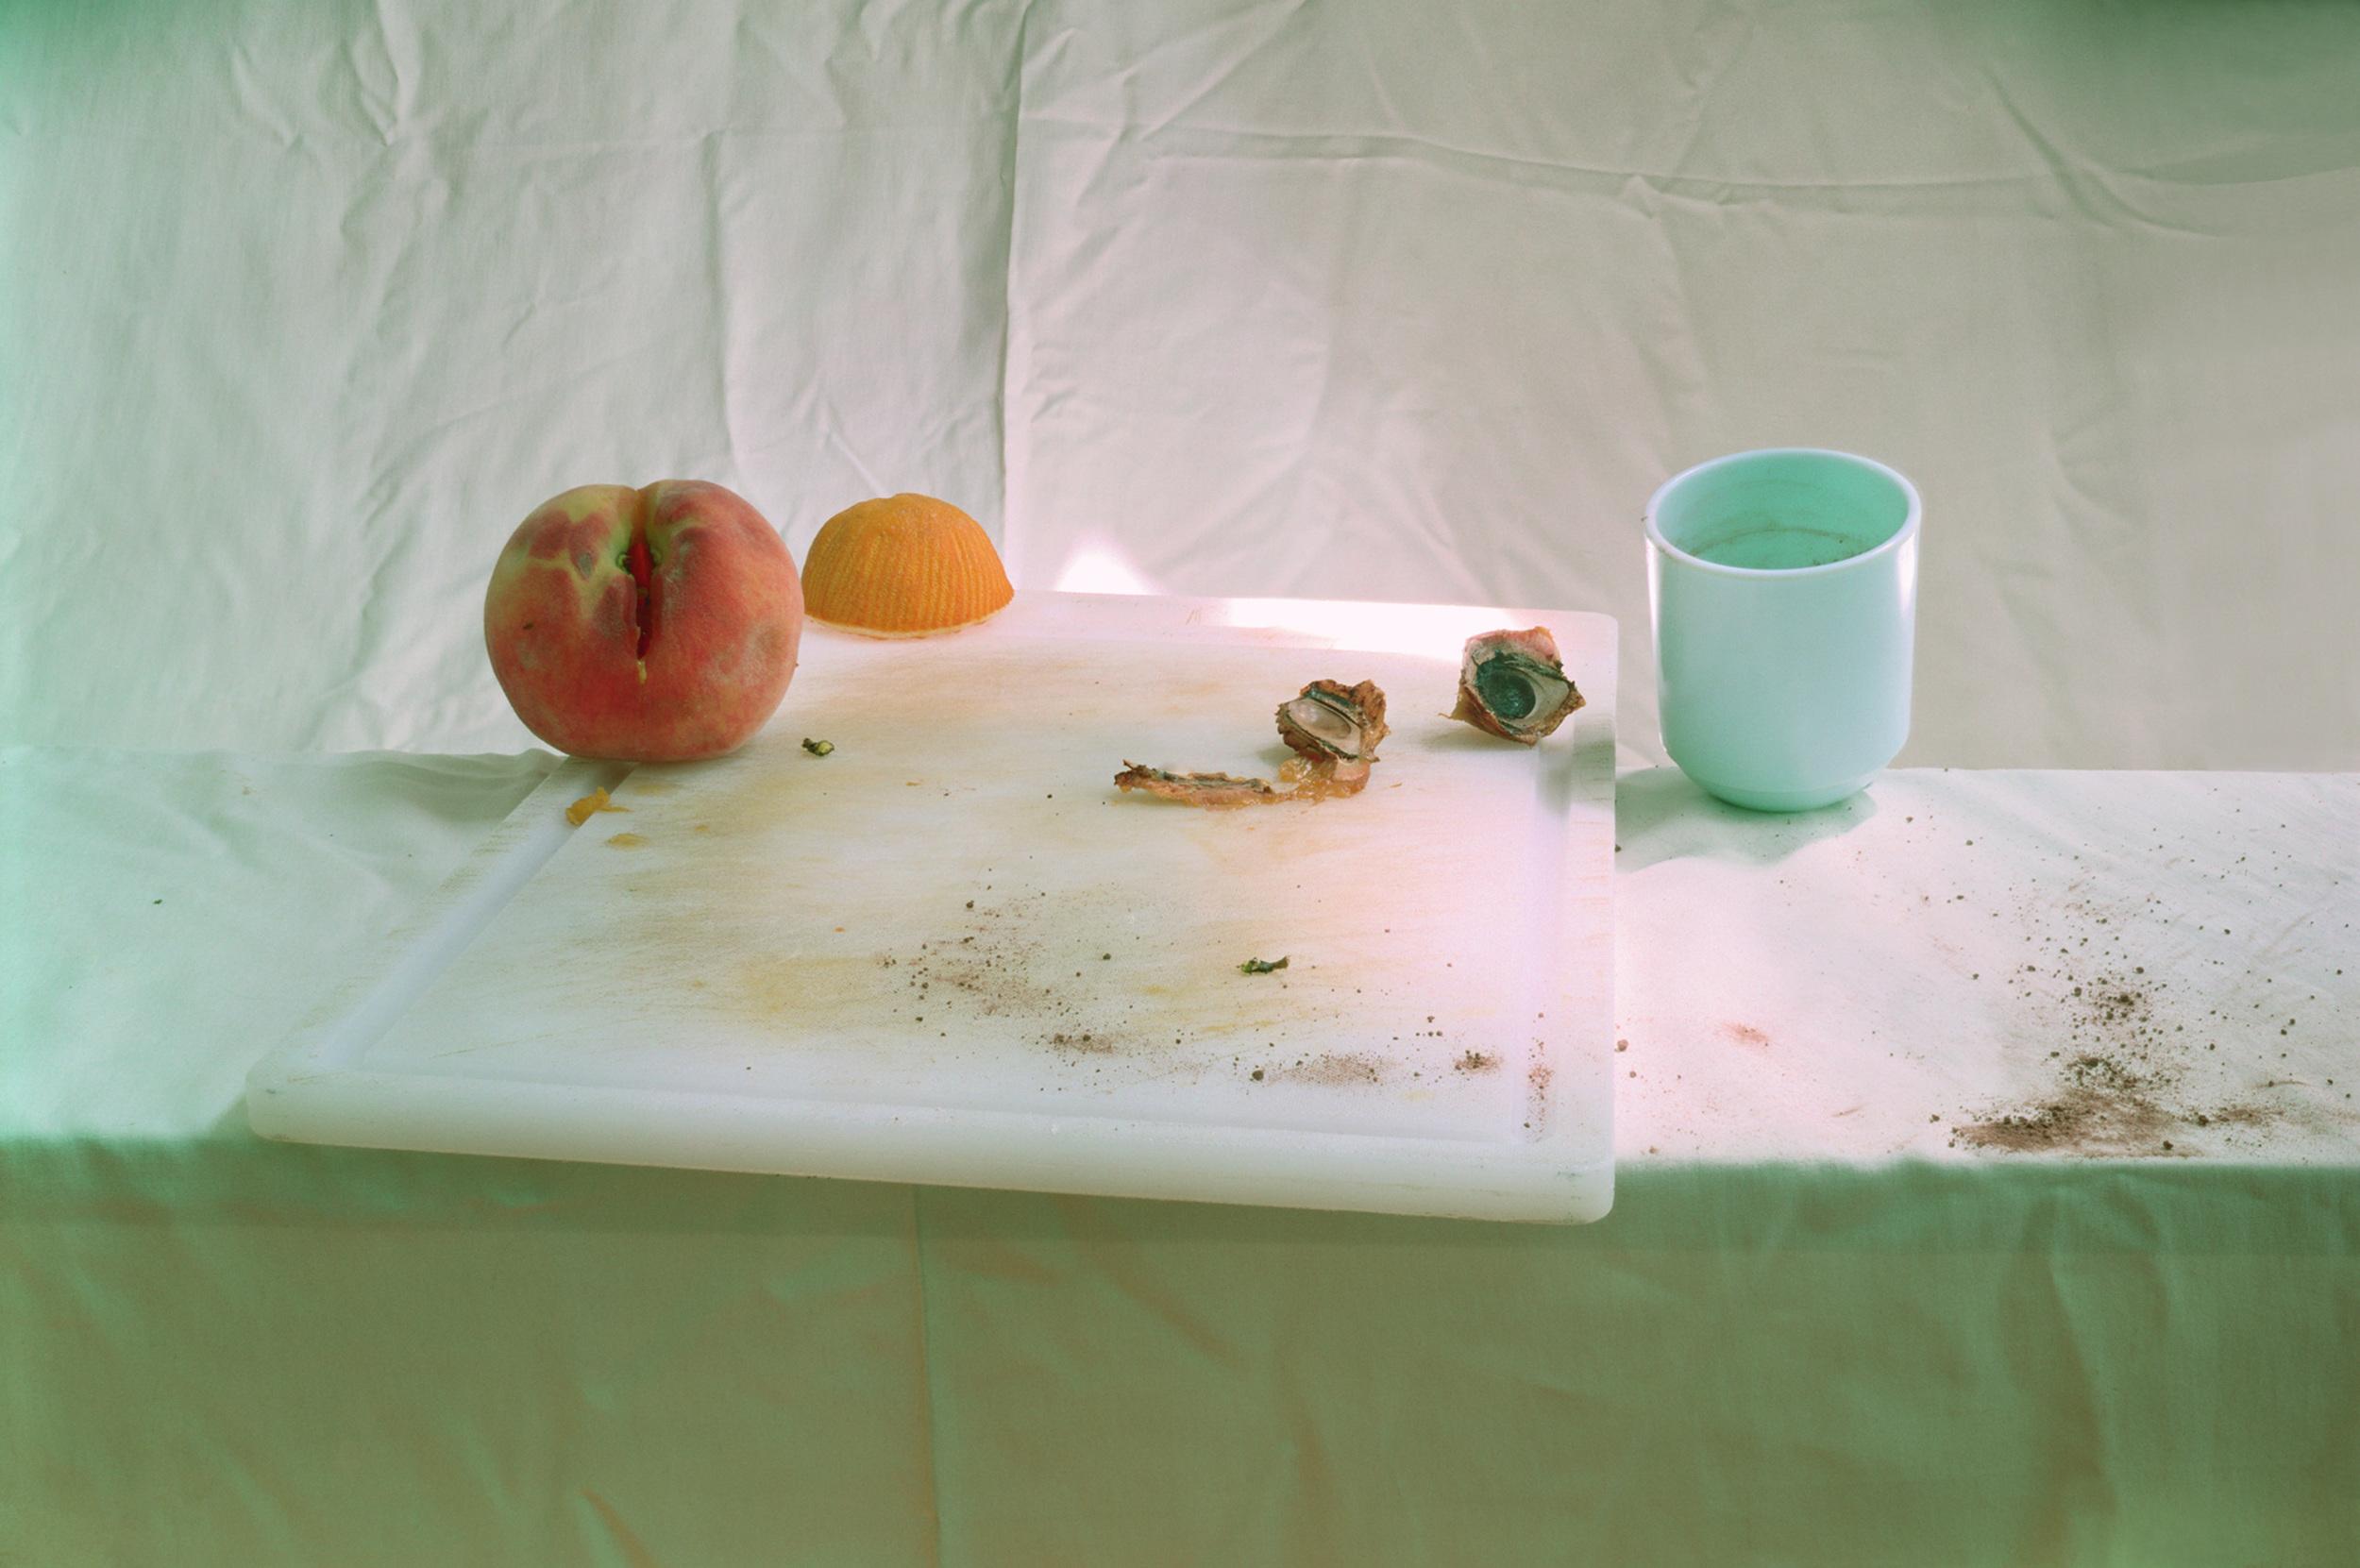 Letinsky-Laura-Untitled-64-2002-peach-hole.jpg